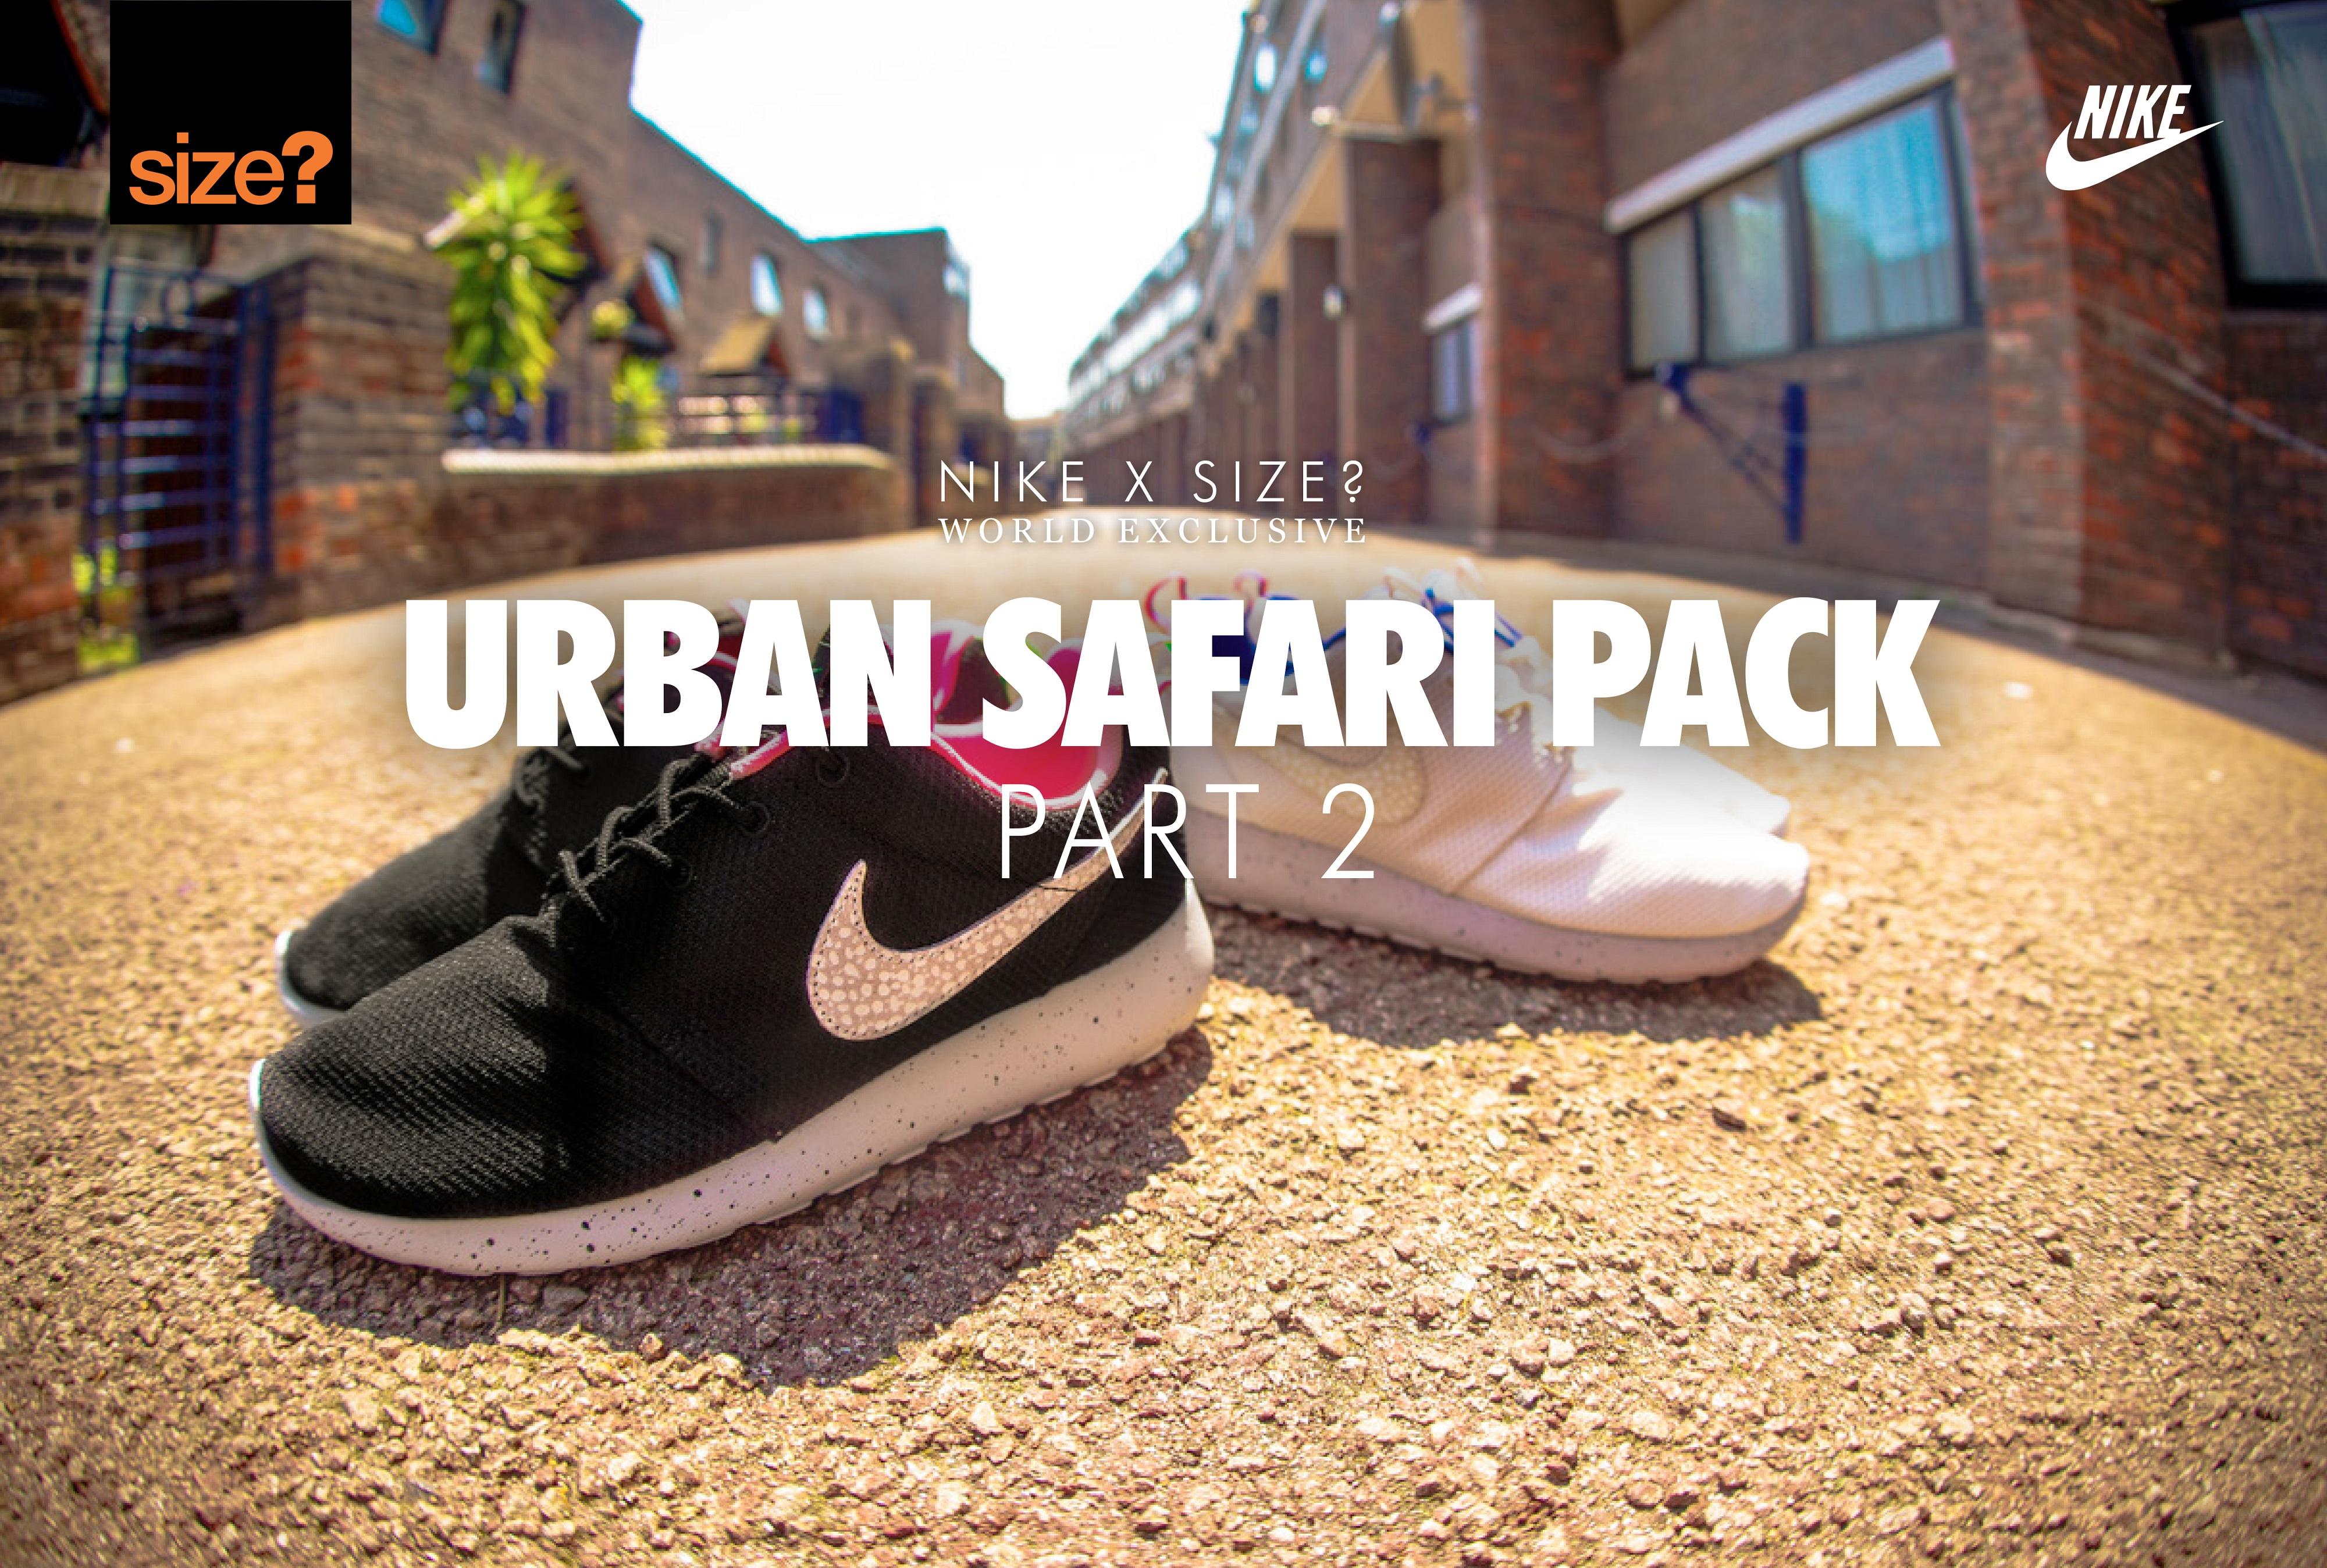 Nike x size? Urban Safari Pack: Part 2 – size? worldwide exclusive